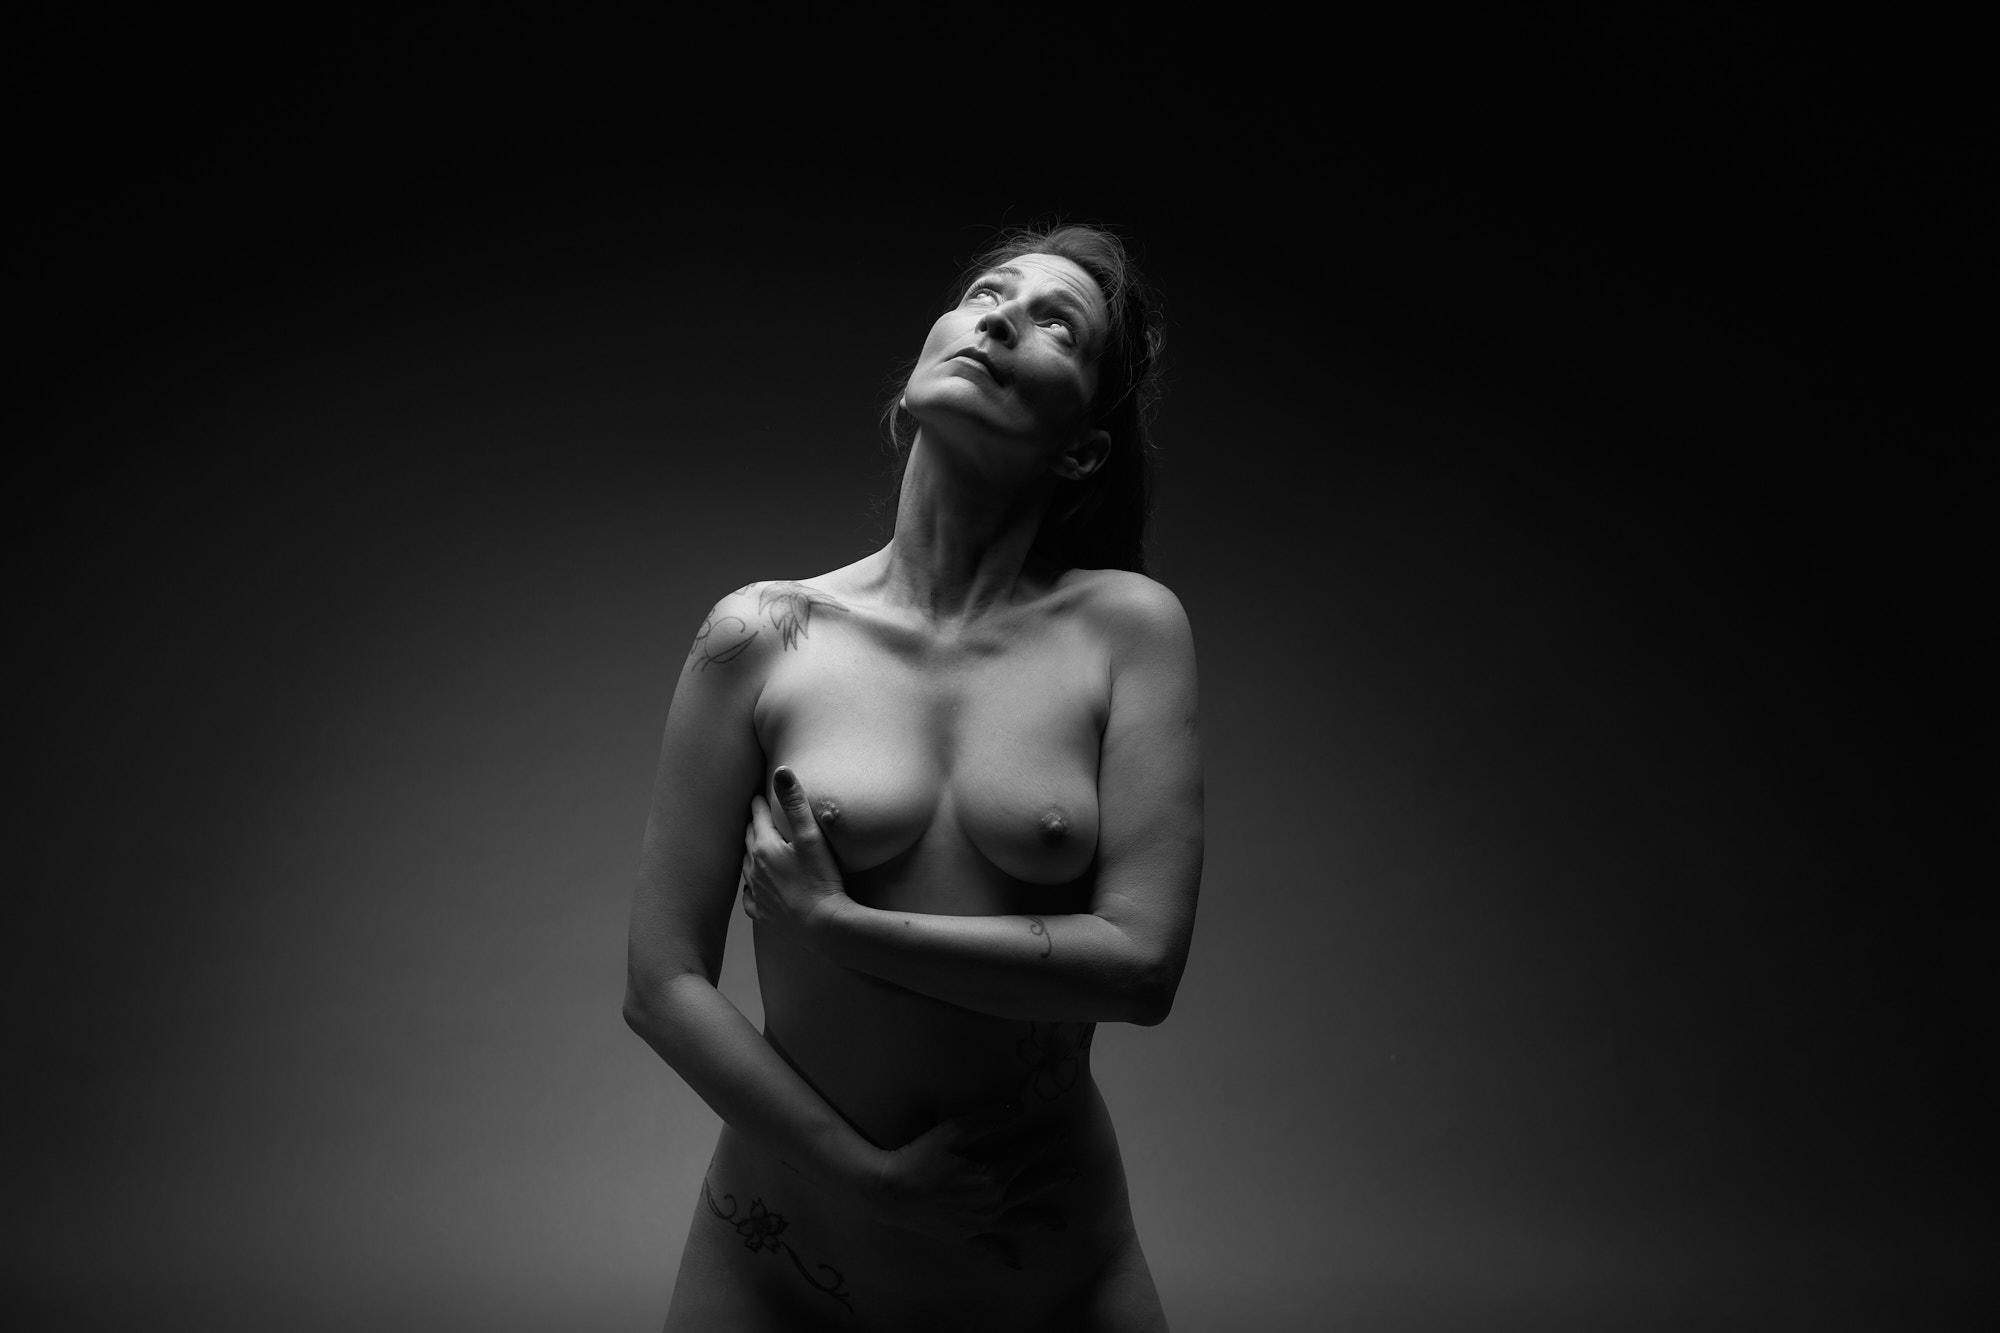 Femme nue debout, regard au ciel